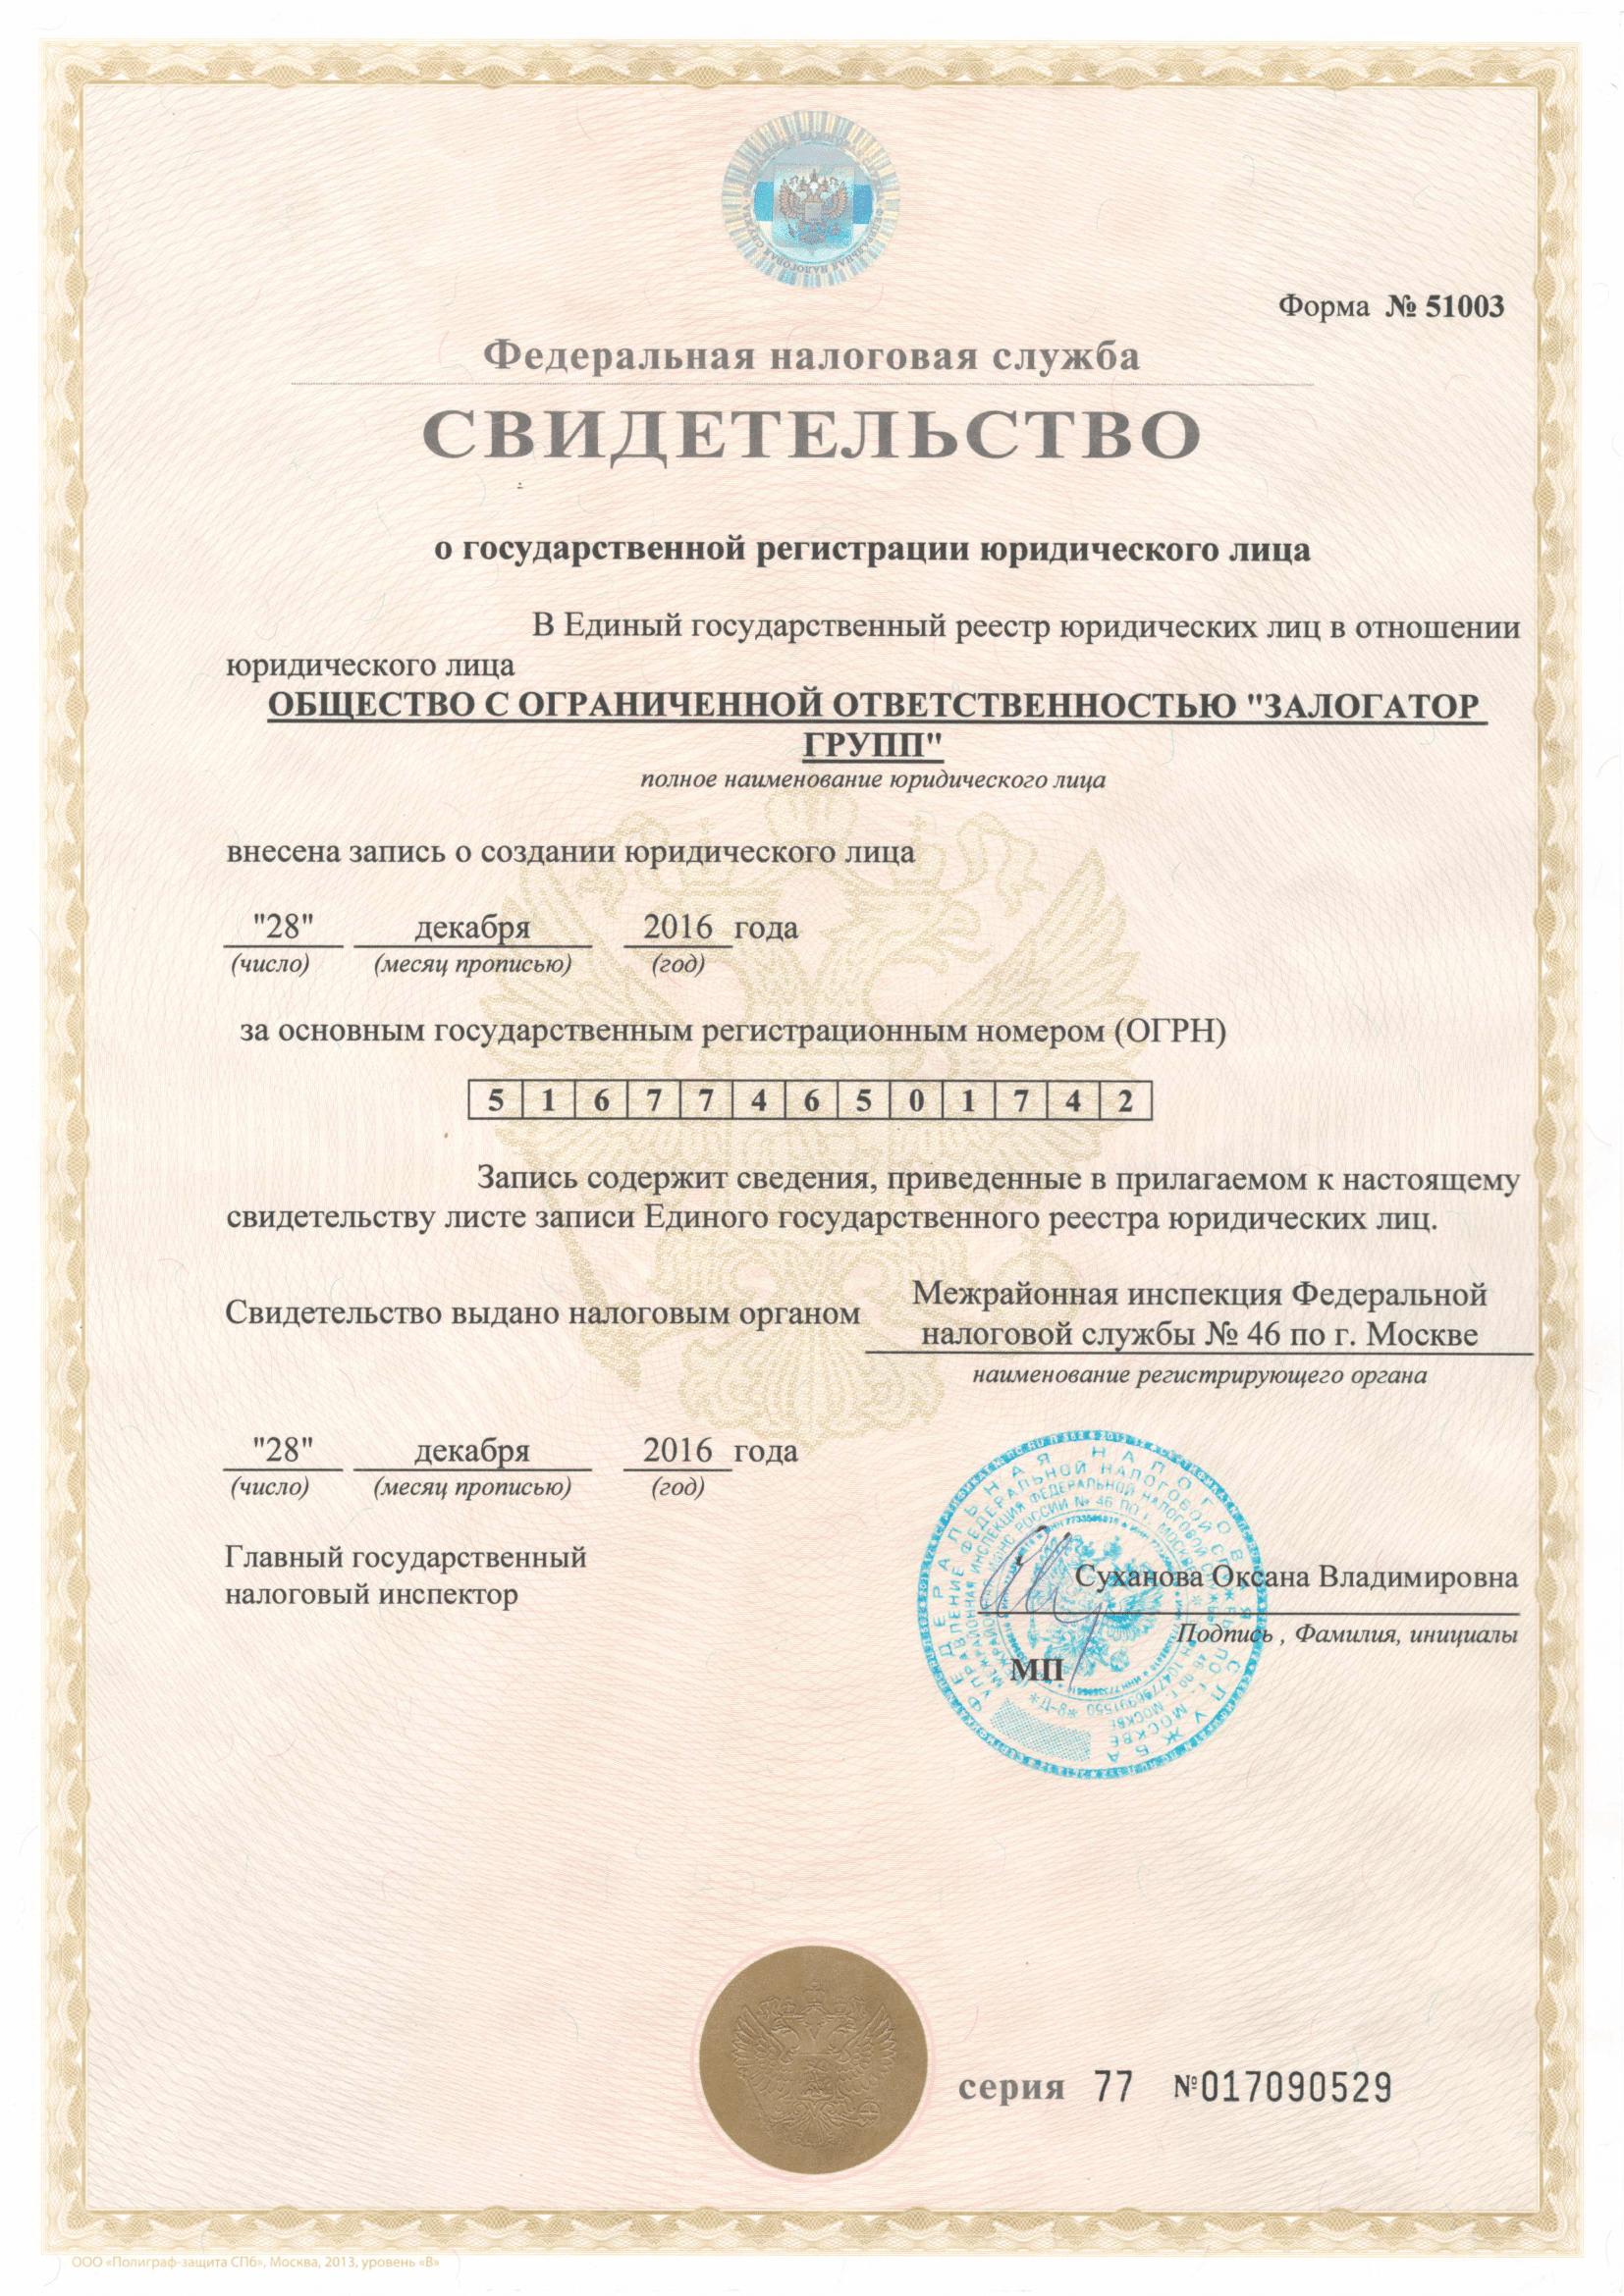 НАРОДНЫЙ АВТОЛОМБАРД - VK